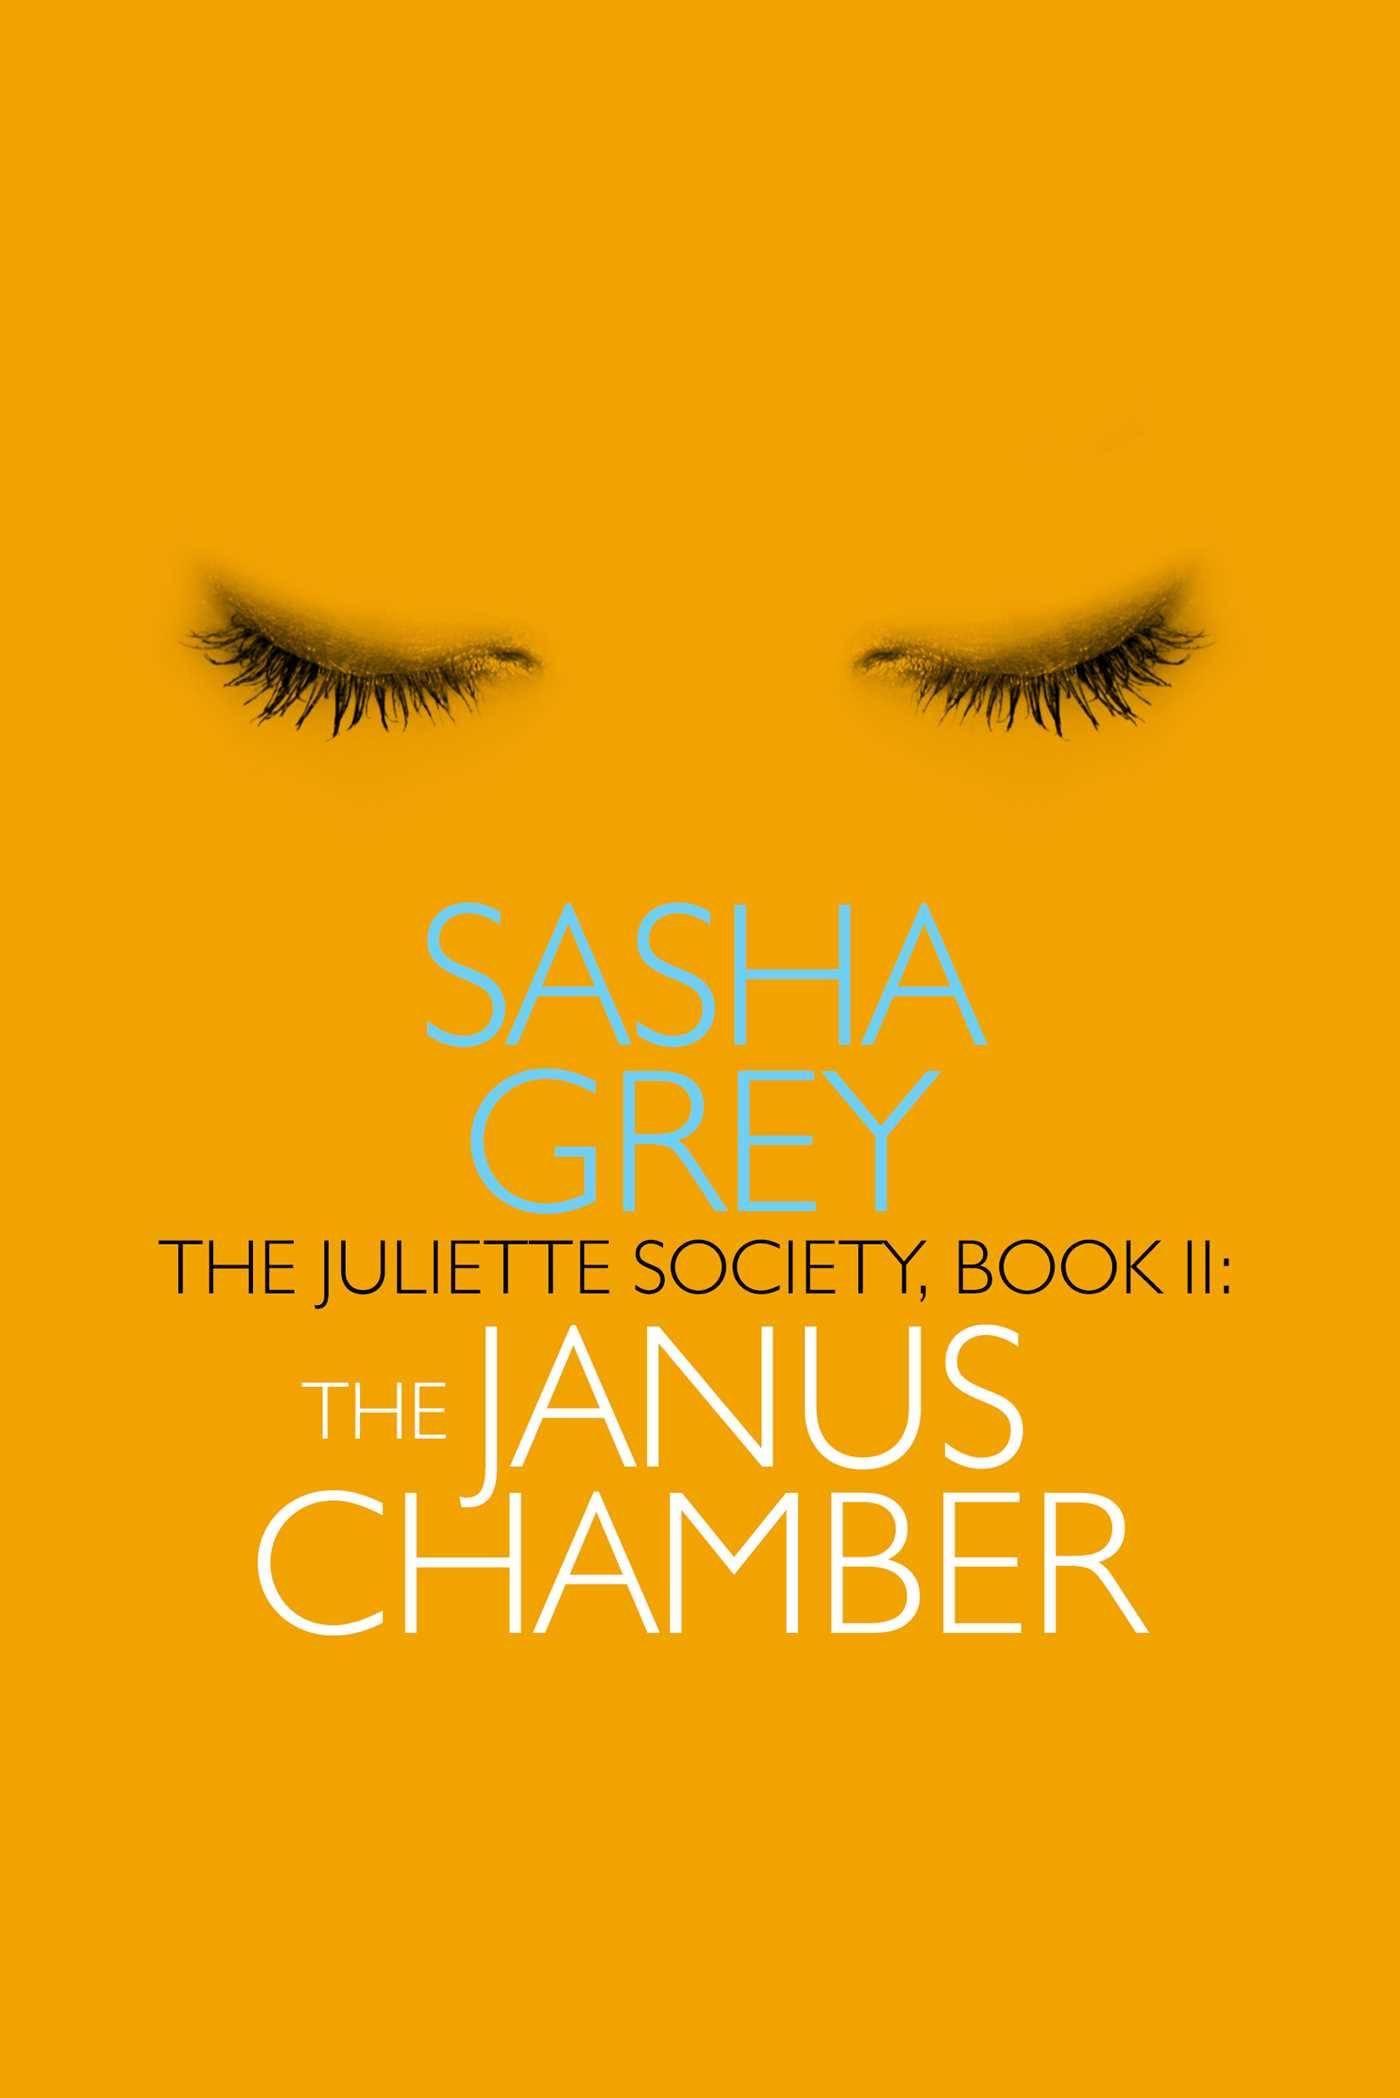 The juliette society book ii the janus chamber 9781627781817 hr